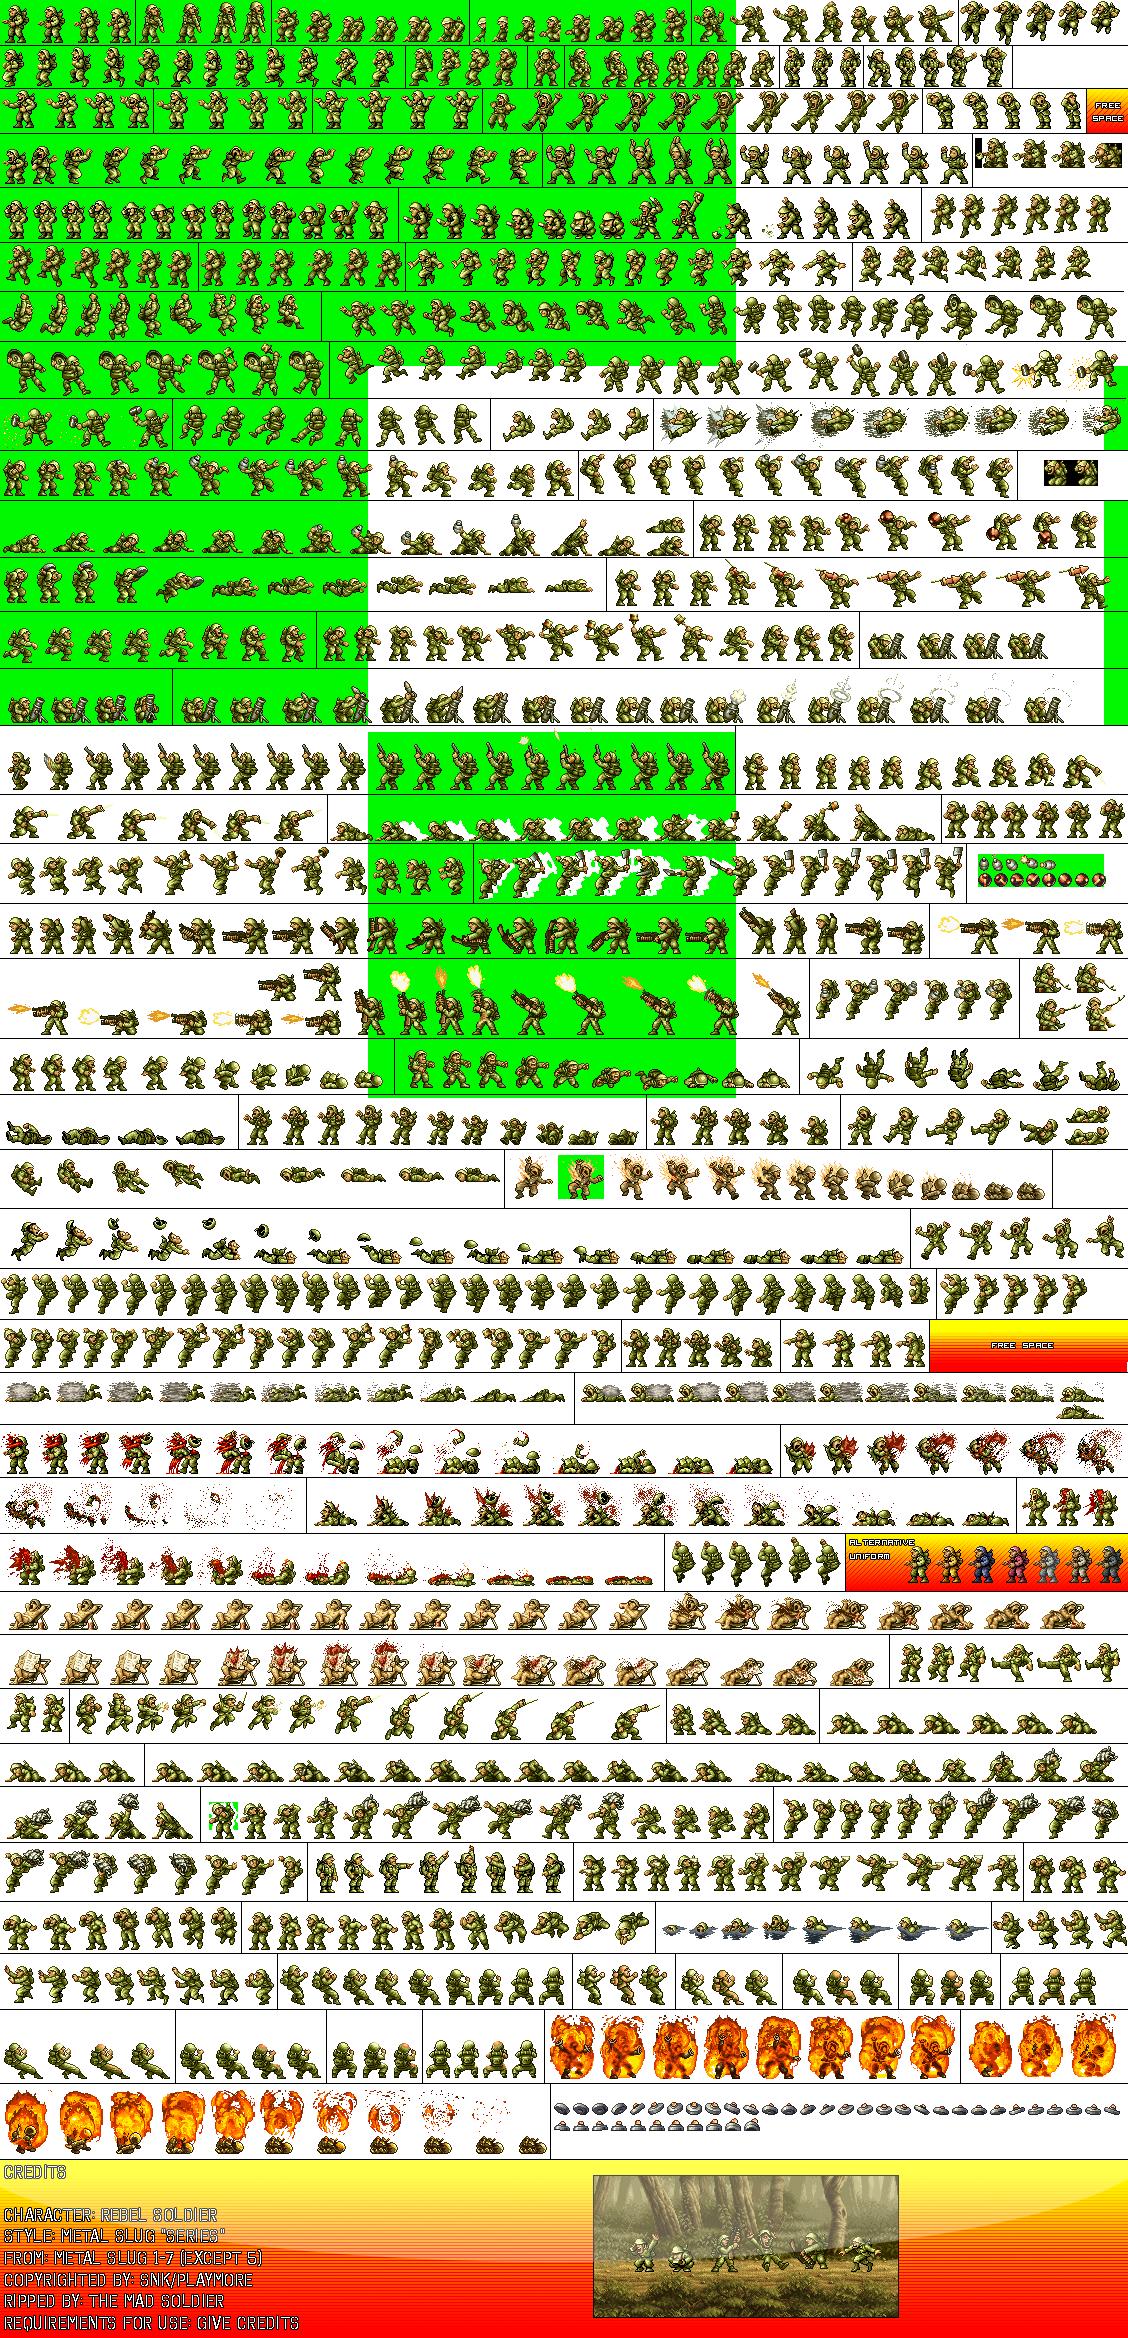 Arcade - Metal Slug 4 - Rebel Soldier - The Spriters Resource